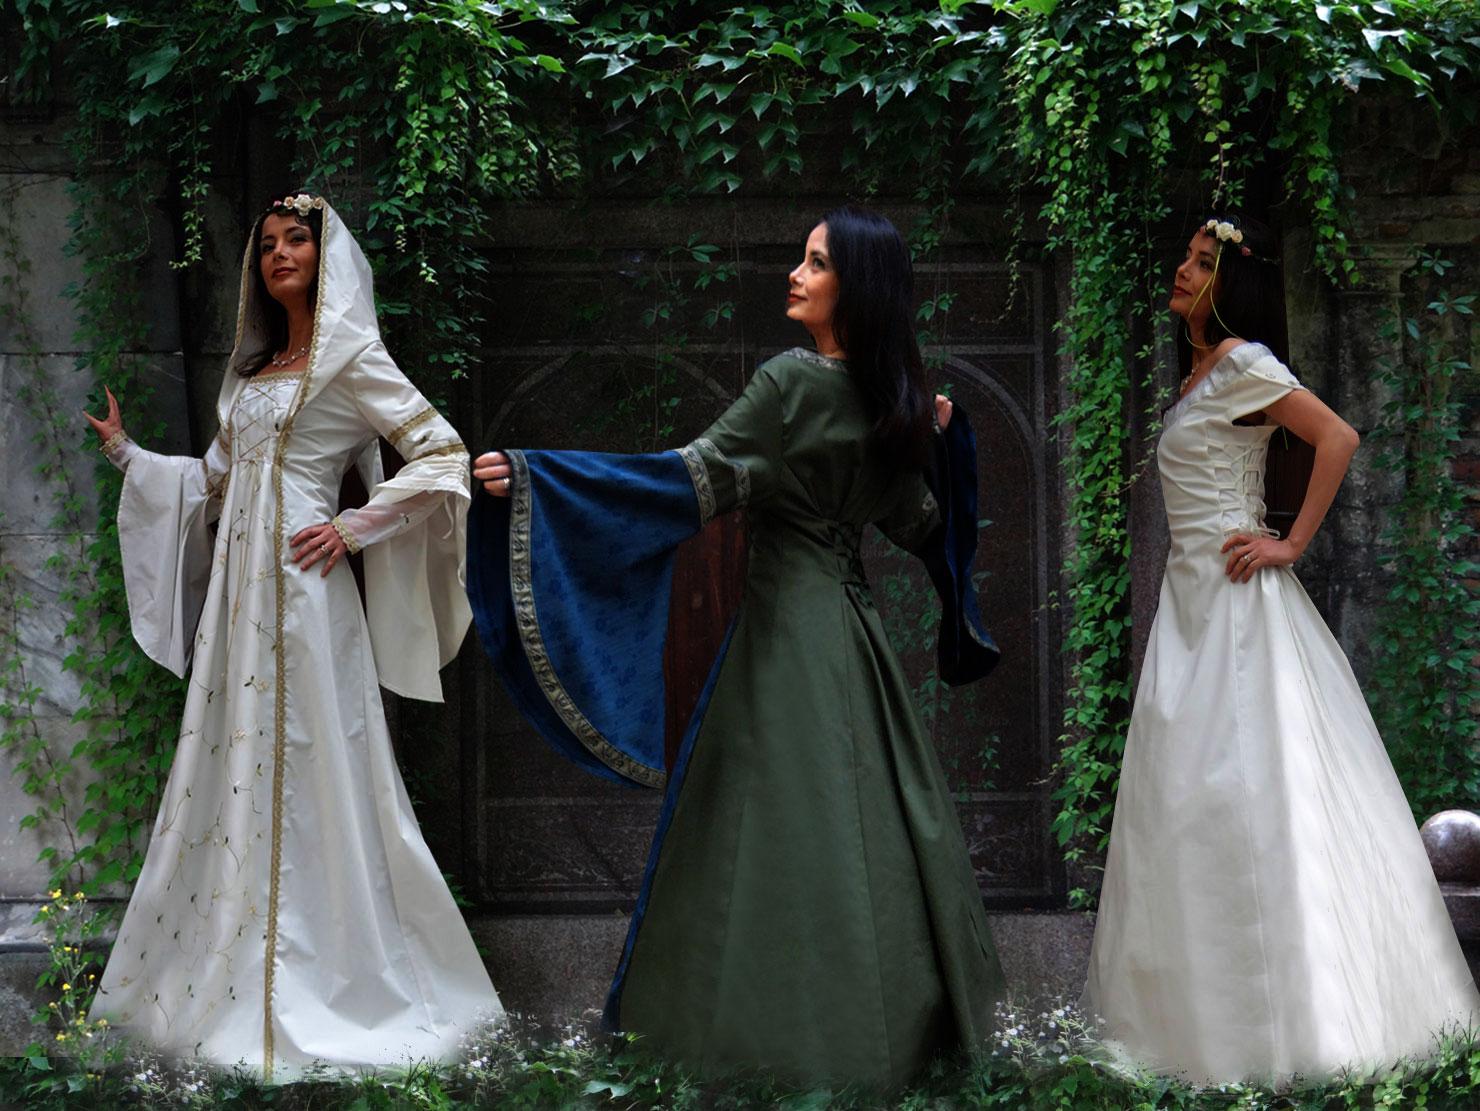 Brautkleid Hochzeitskleid Kapuze Mittelalterkleid Kleid Mittelalter